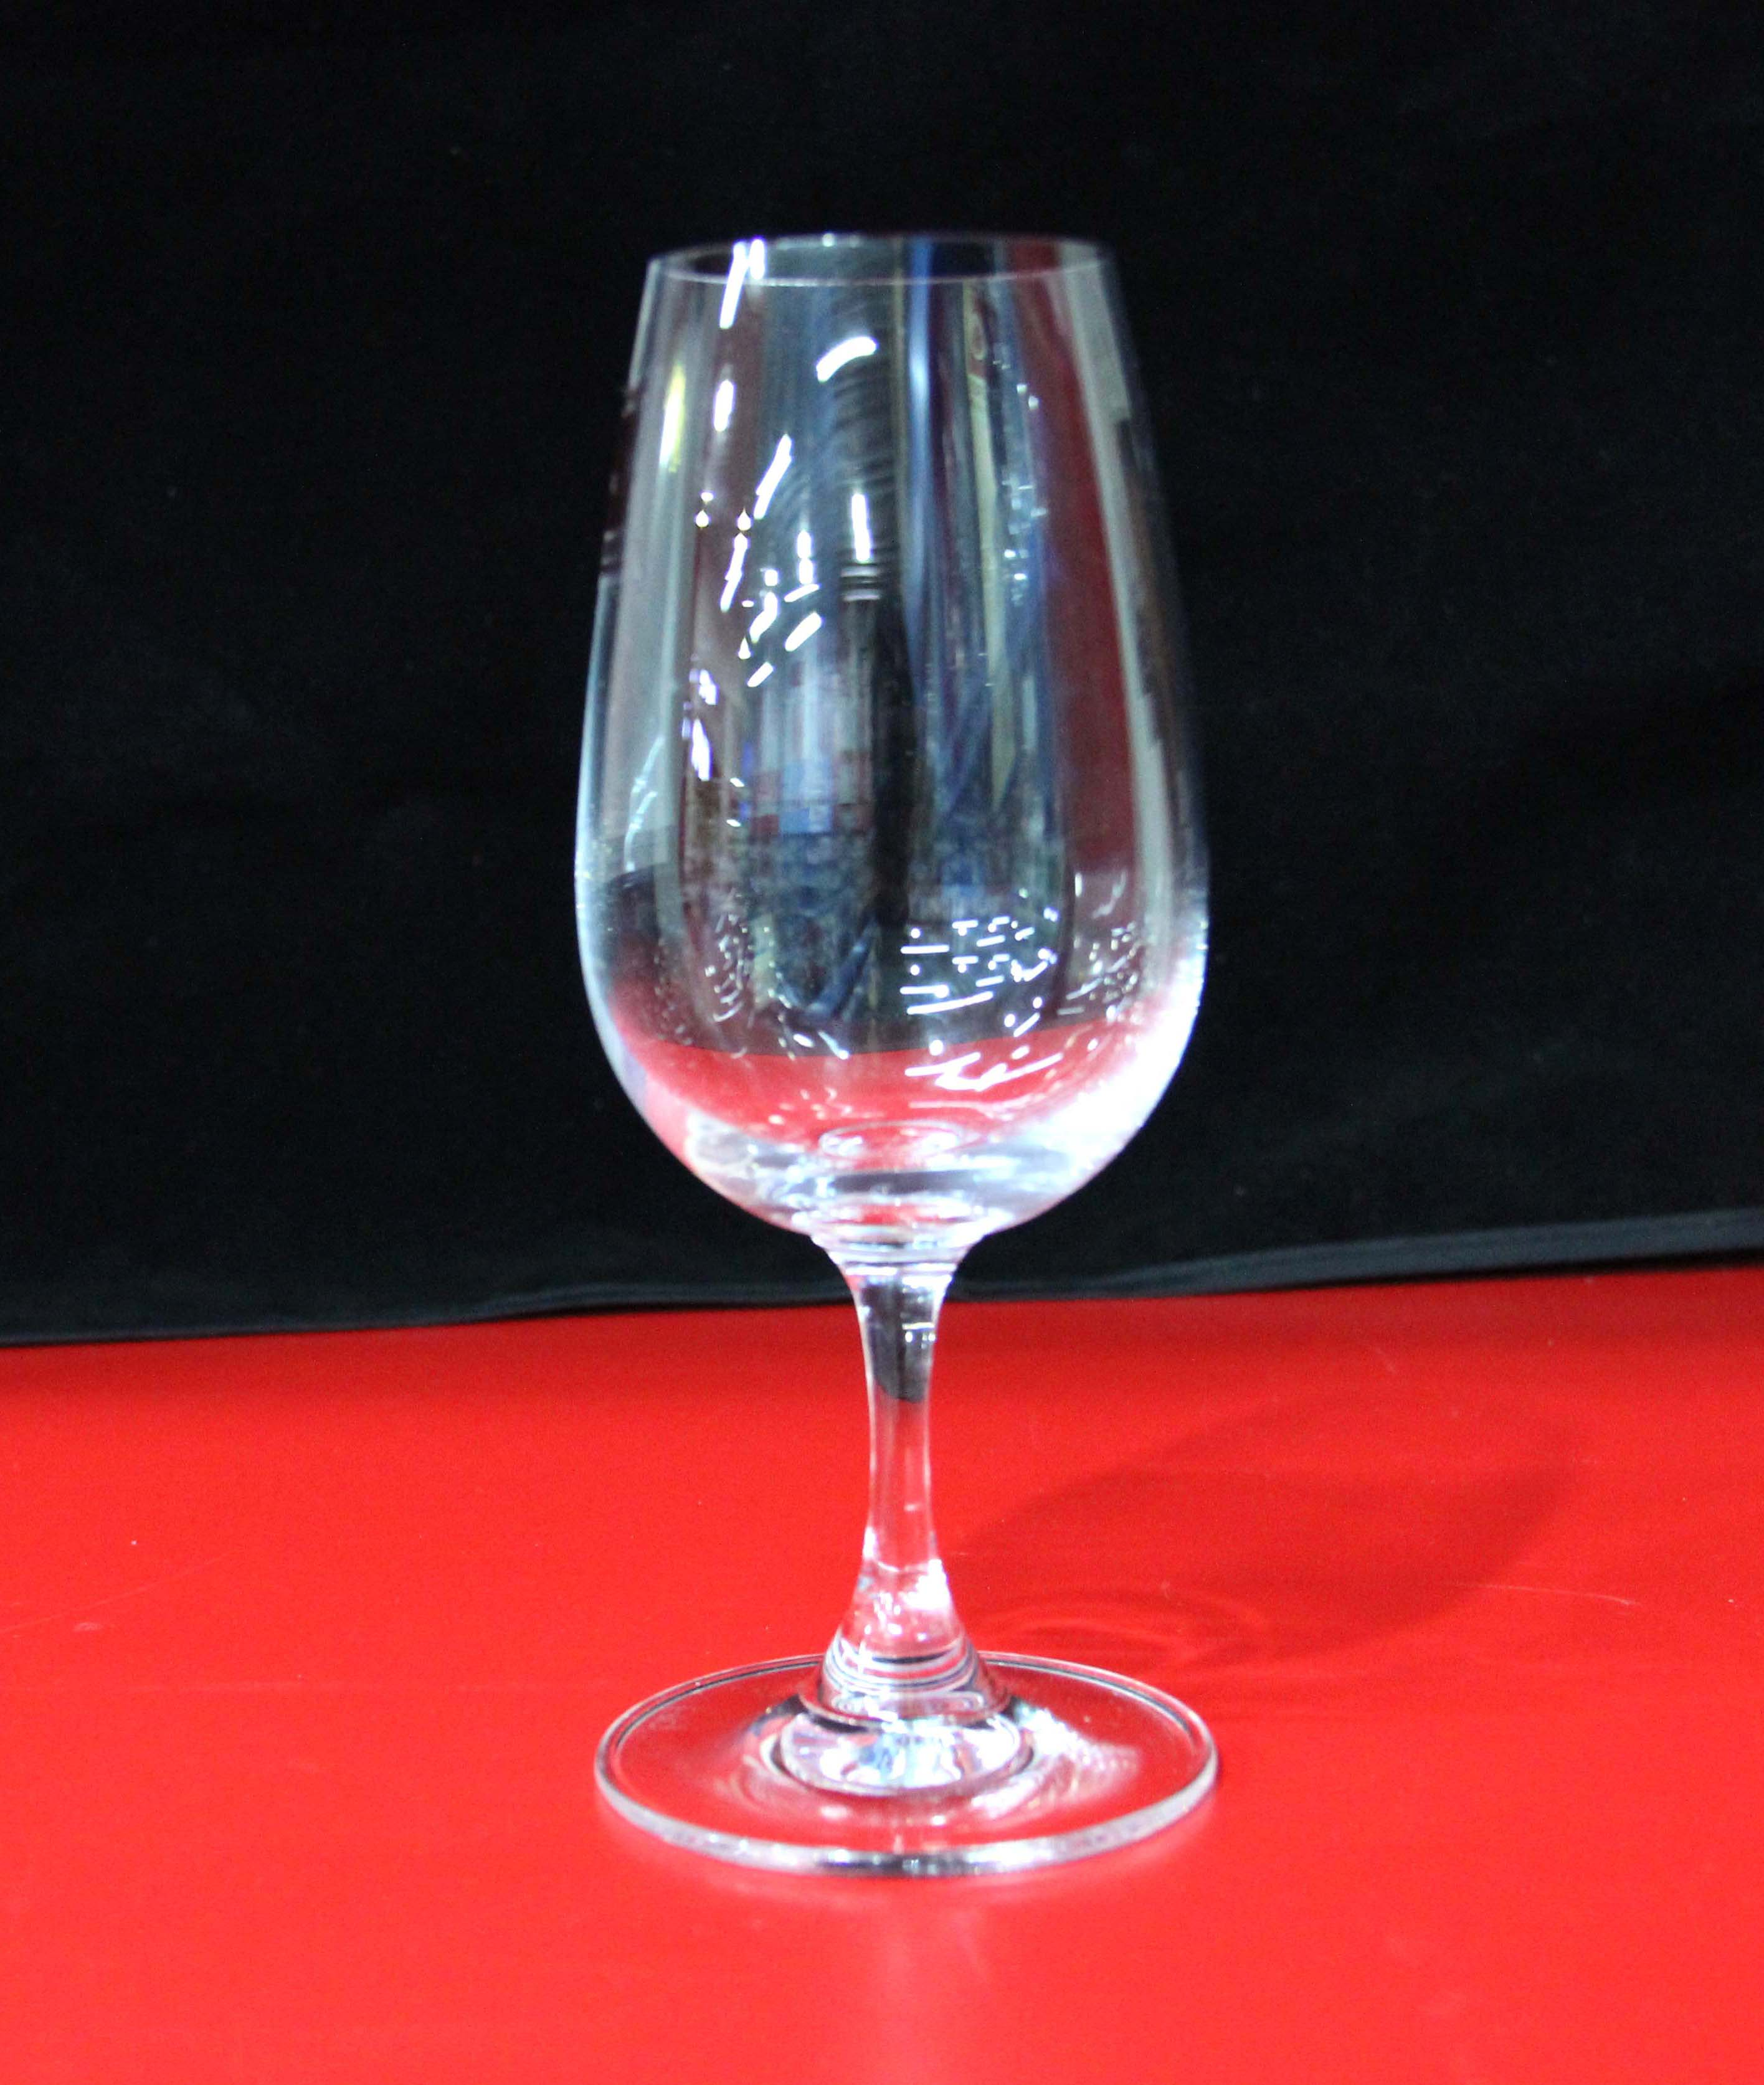 ISO国际标准红酒杯盲品杯国际标准品酒杯ISO杯吐酒桶6只包邮